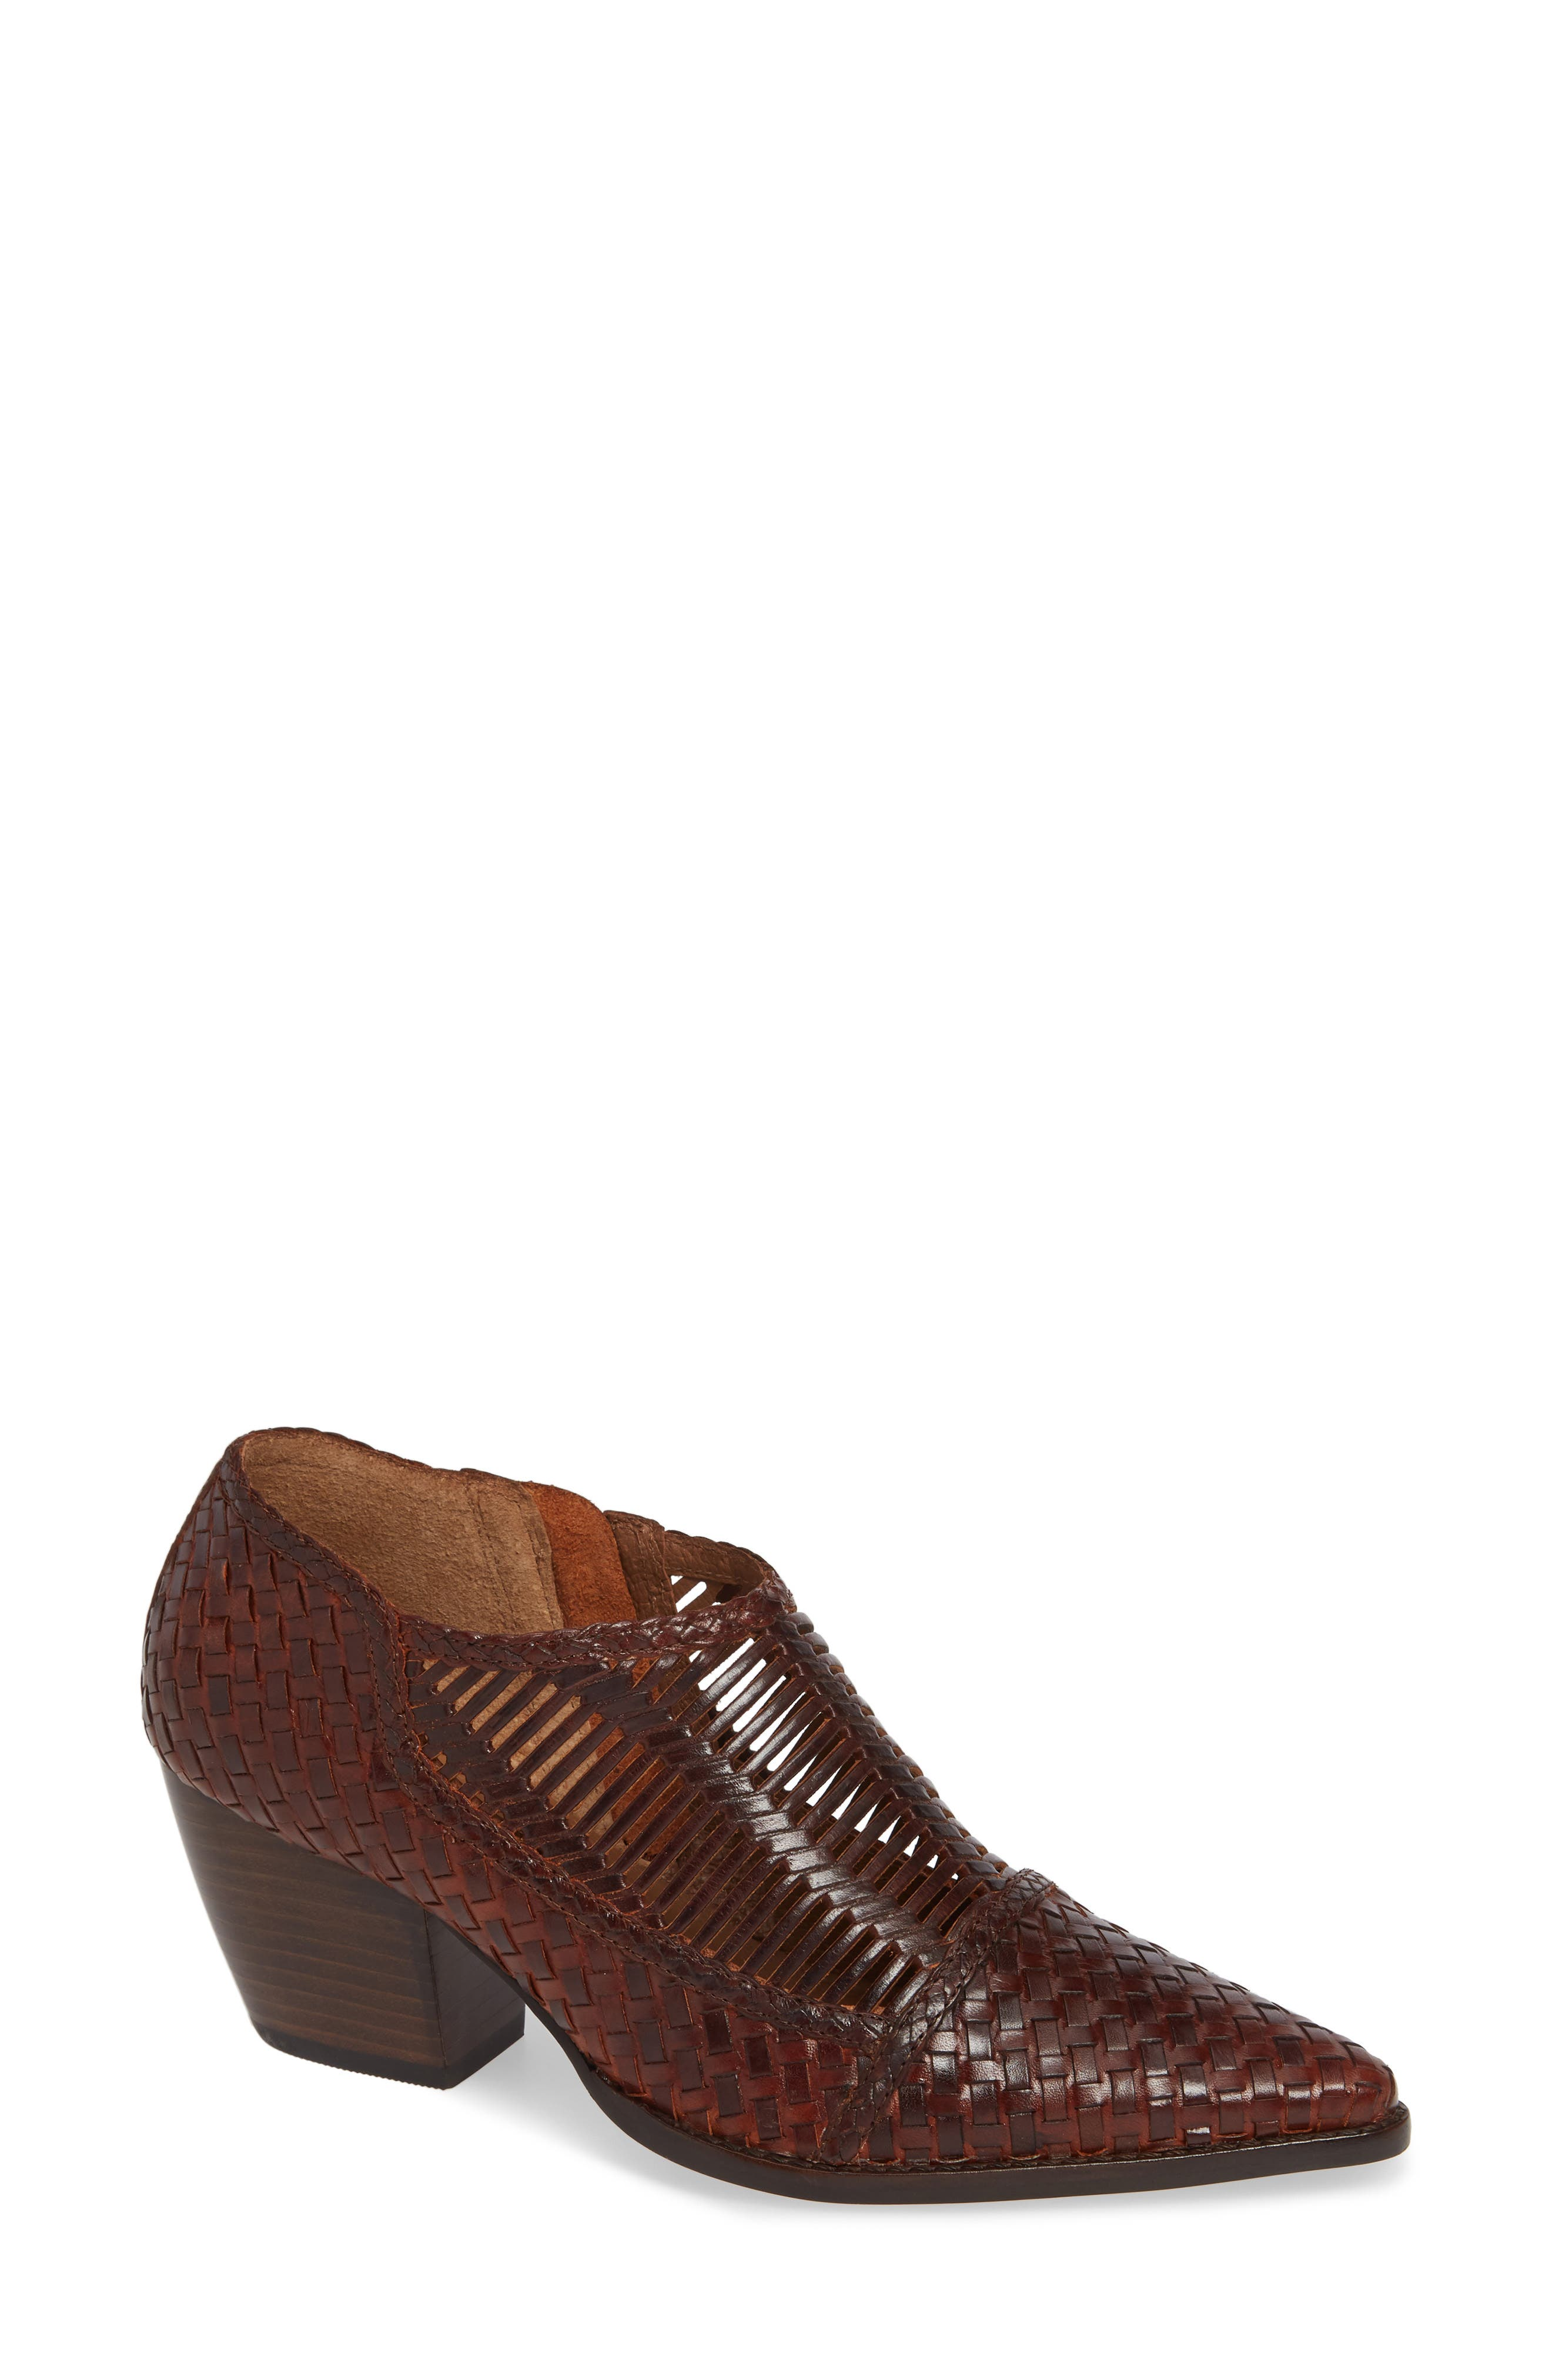 Matisse Vigo Woven Bootie, Brown